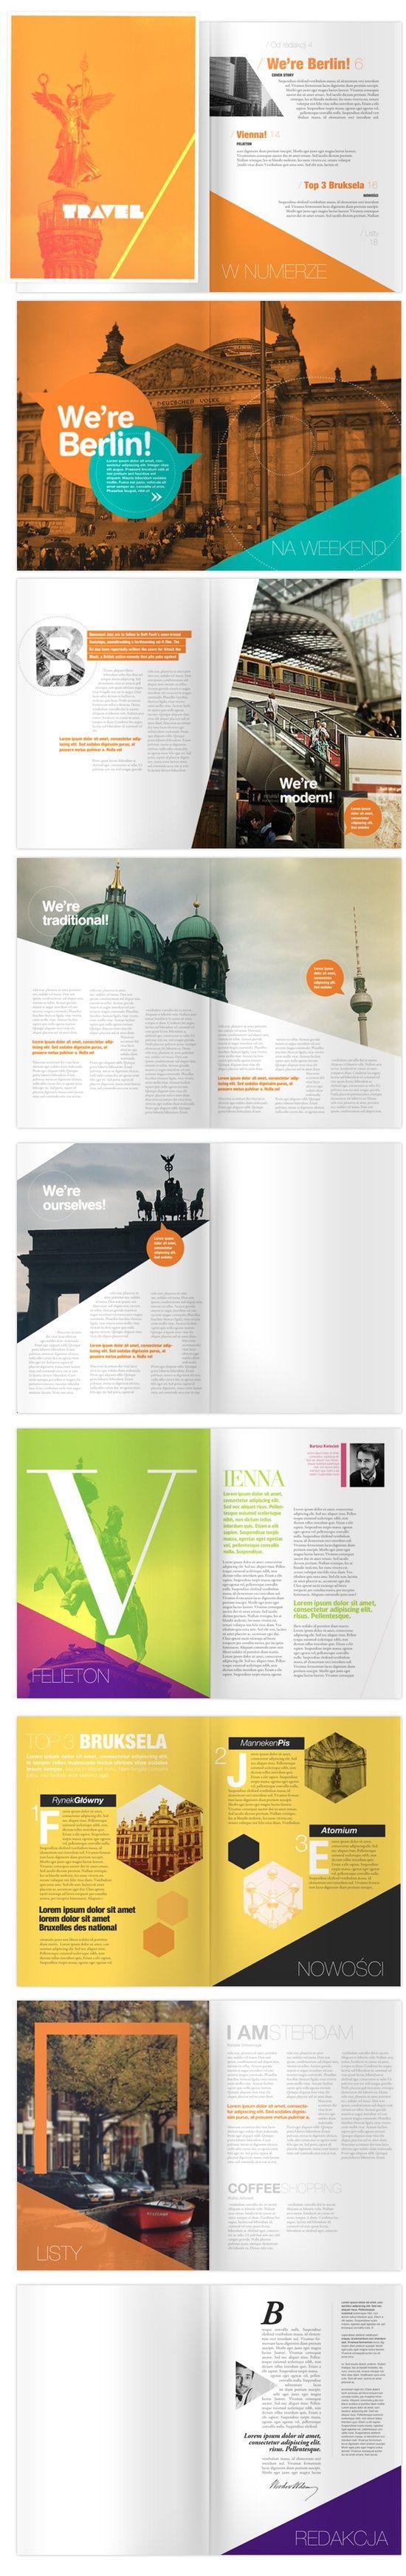 Ciara Pin 2- TRAVEL Magazine. Nice asymmetry